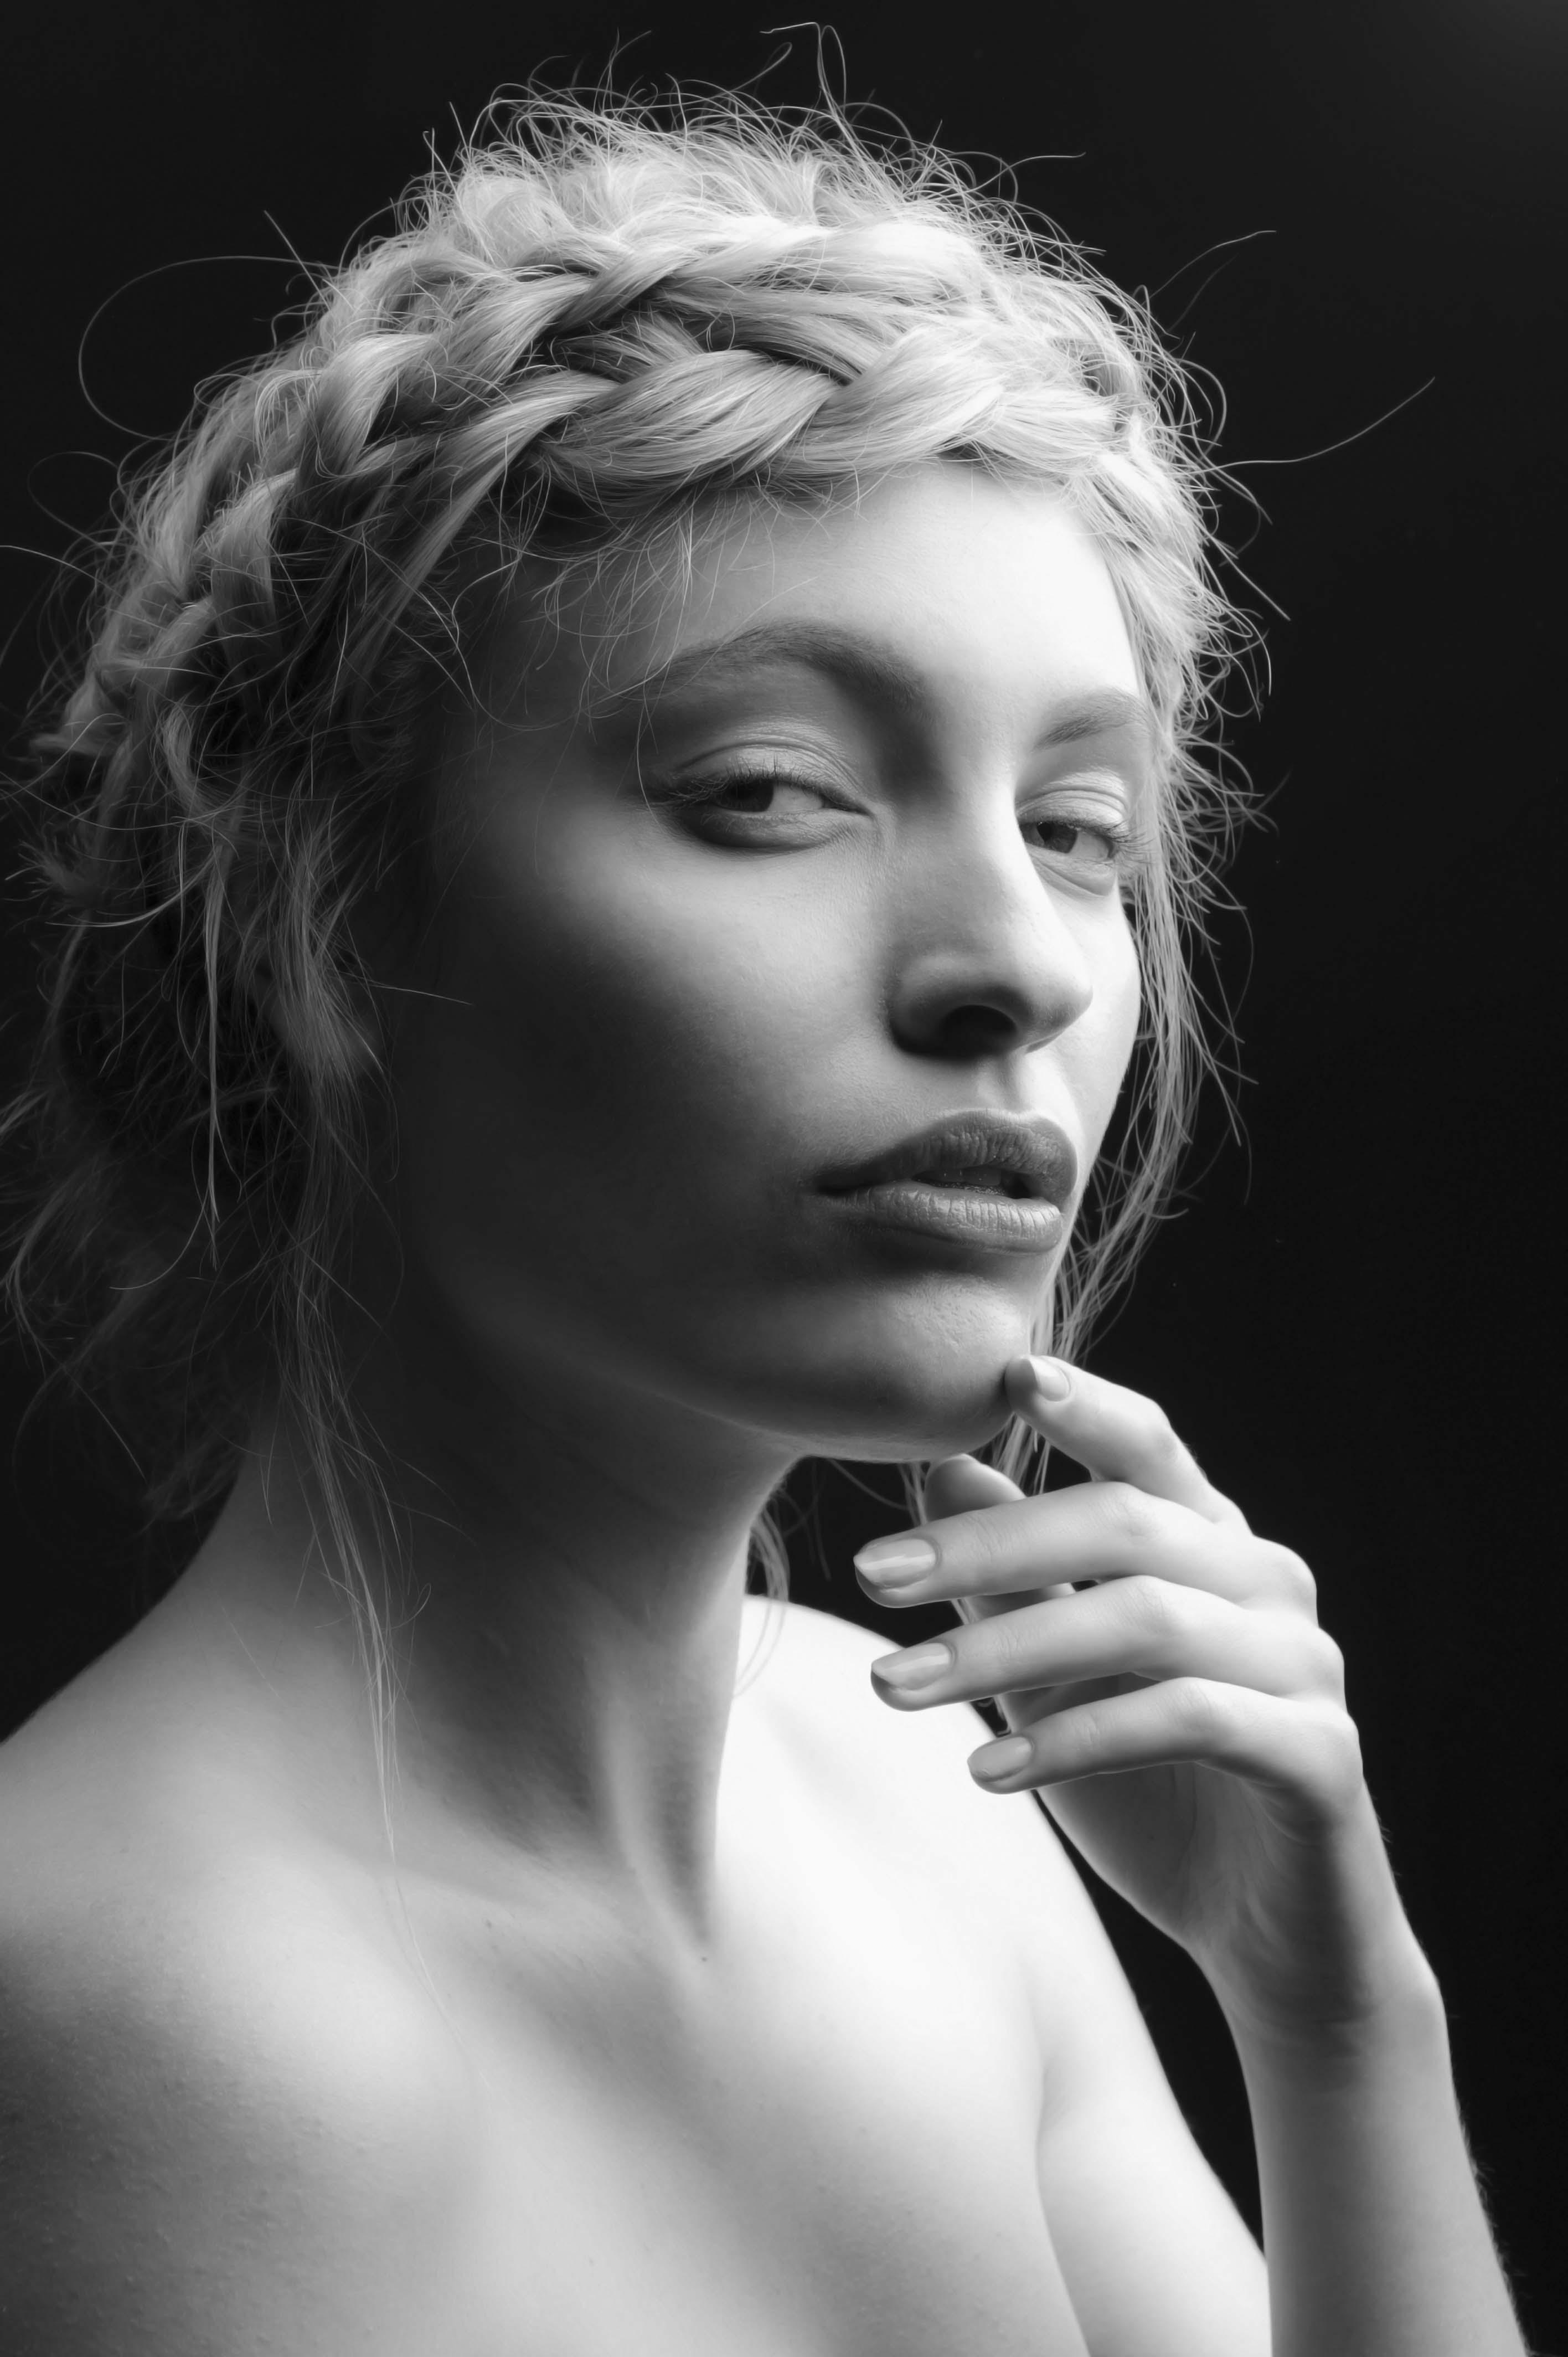 beauty / portrait